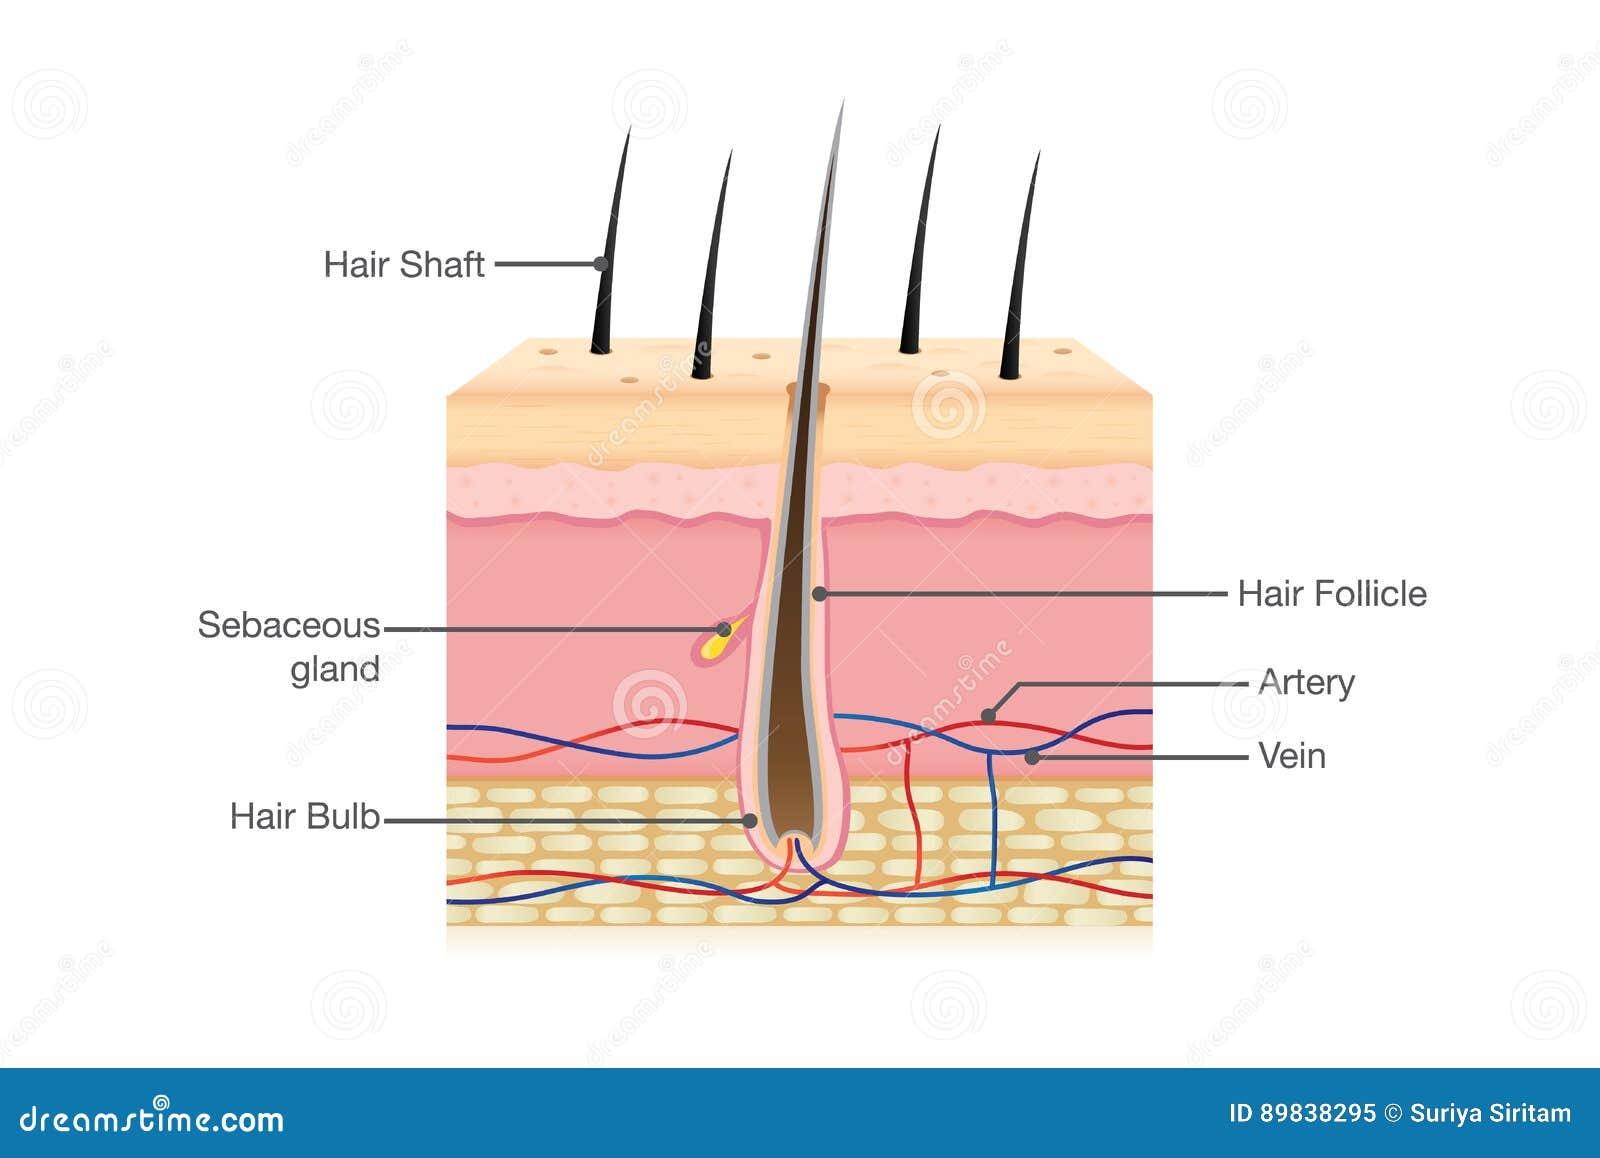 Hair Shaft Diagram | Hair Anatomy Diagram Head Diy Enthusiasts Wiring Diagrams